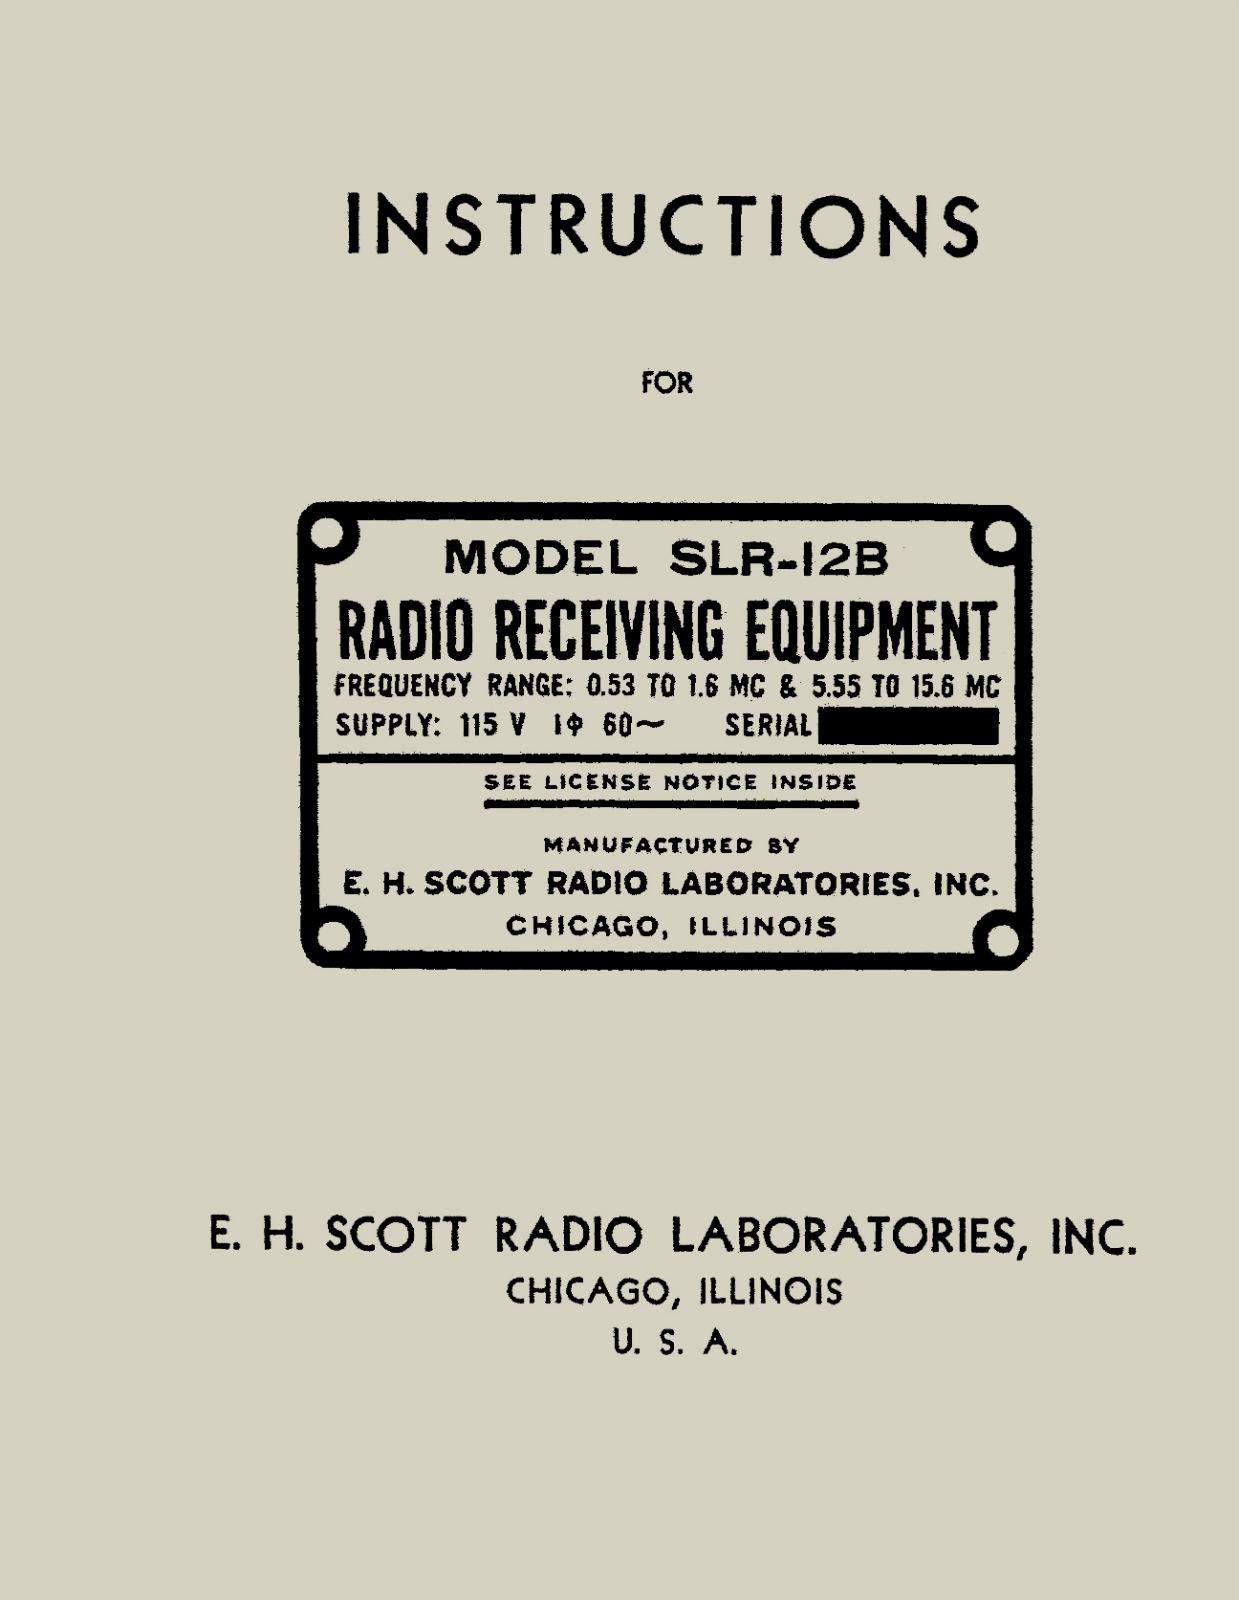 Robert's Military Radios : IB-SLR-12B REPRINT INSTRUCTIONS MODEL SLR